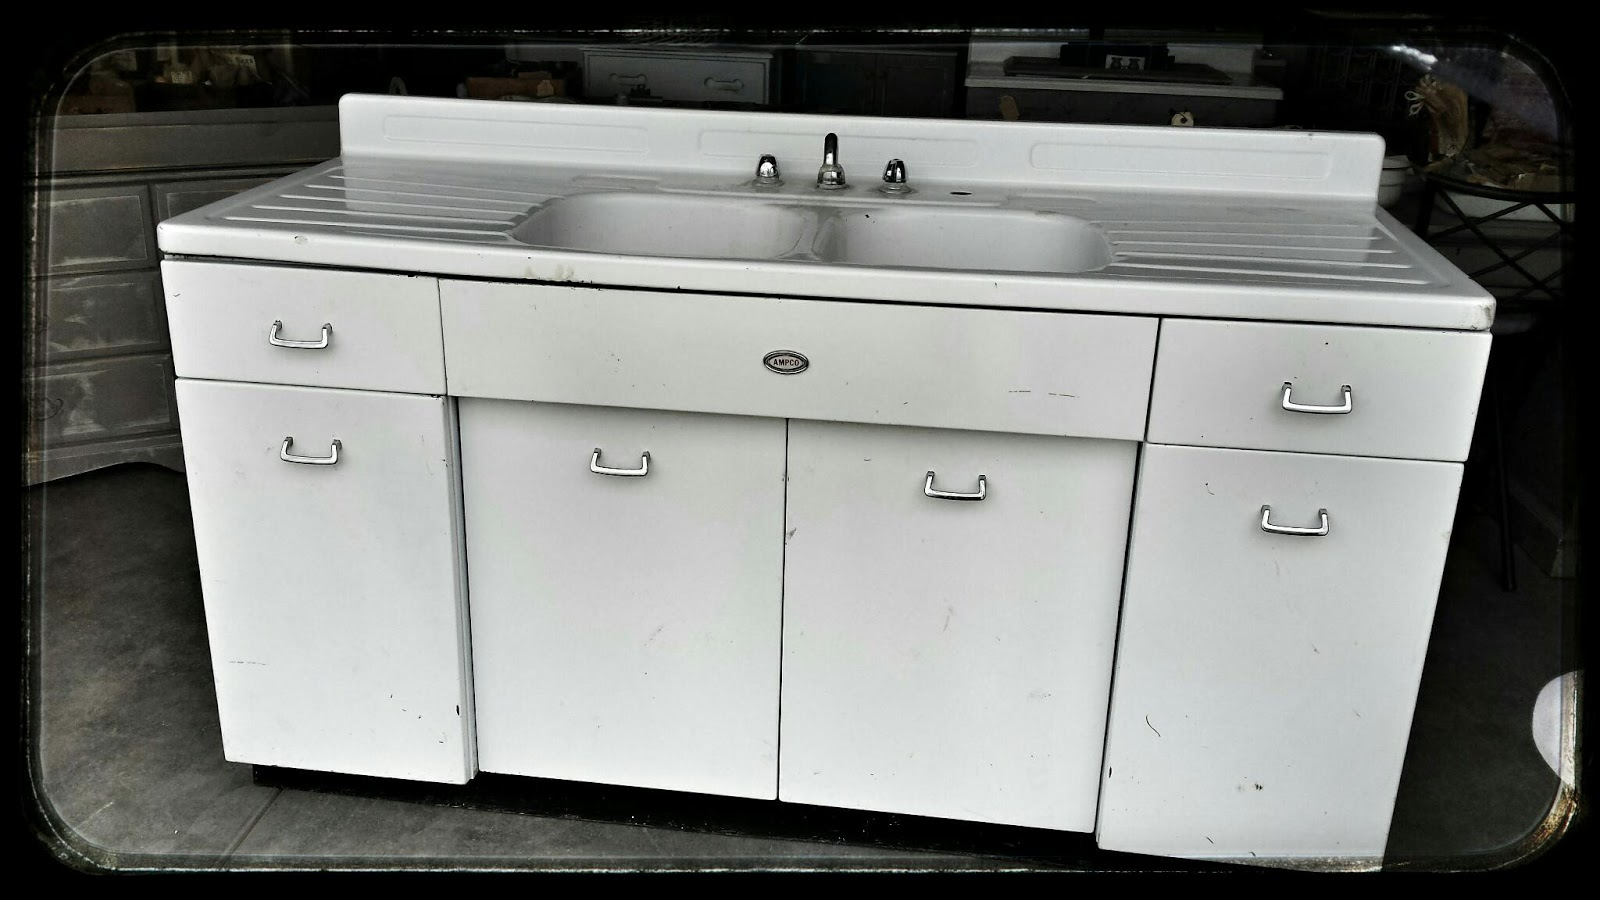 carmen 39 s curiosity shop 6 foot old white metal sink with metal cabinet. Black Bedroom Furniture Sets. Home Design Ideas